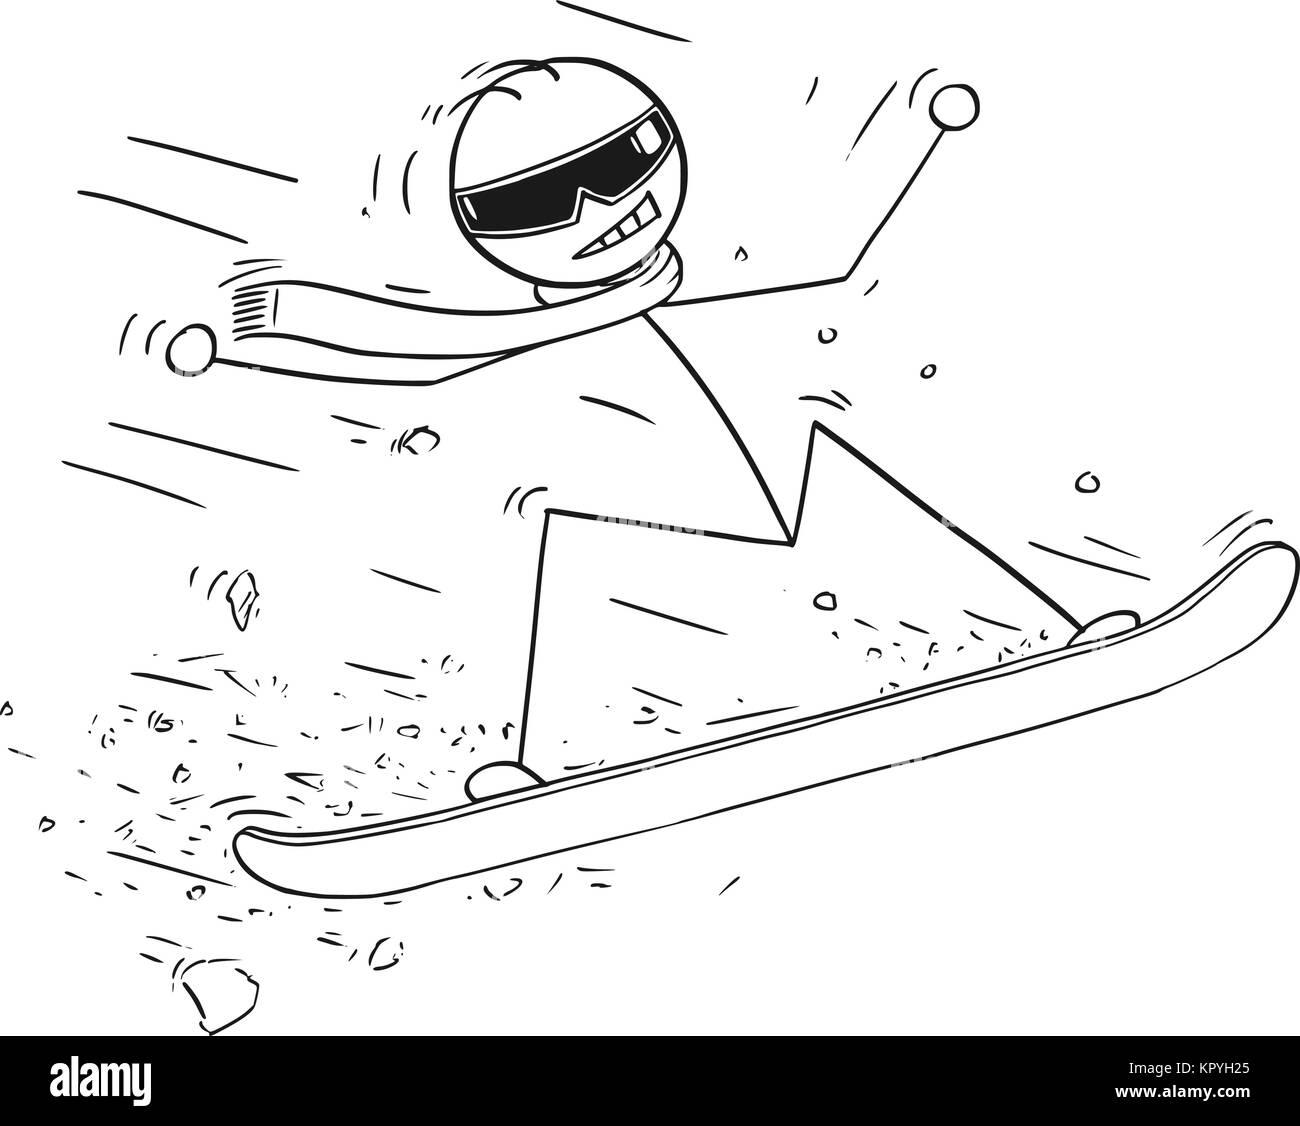 Cartoon stick man drawing illustration of man snowboarding on snowboard. - Stock Image